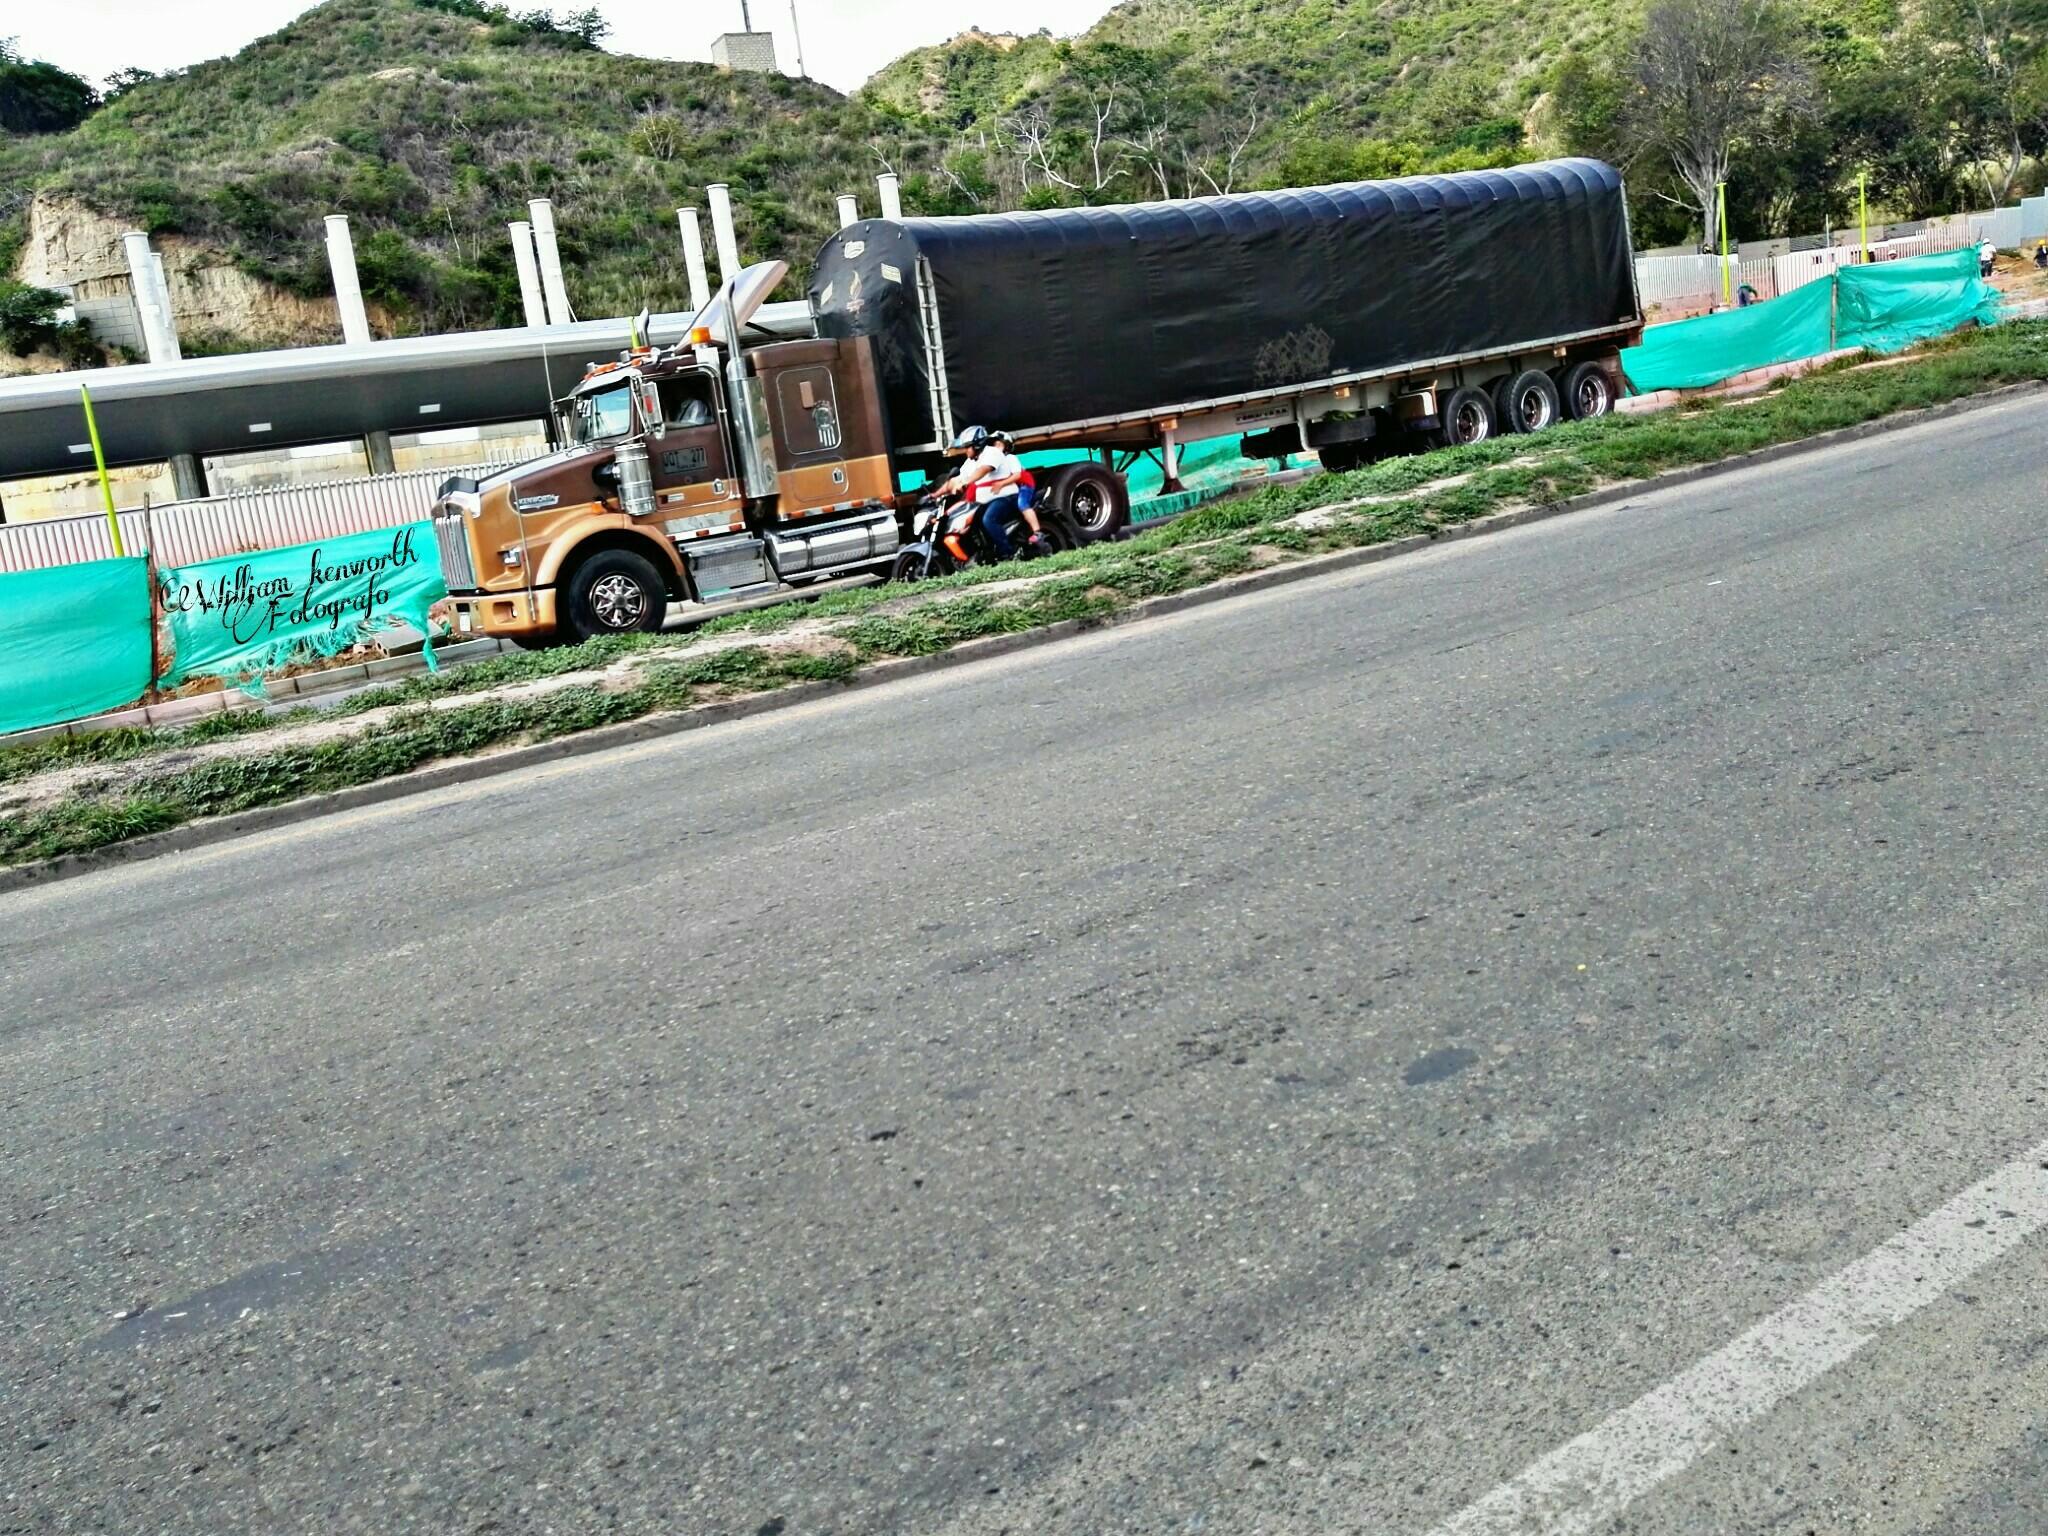 Camiones-Sencillo-Truck-Photo-30